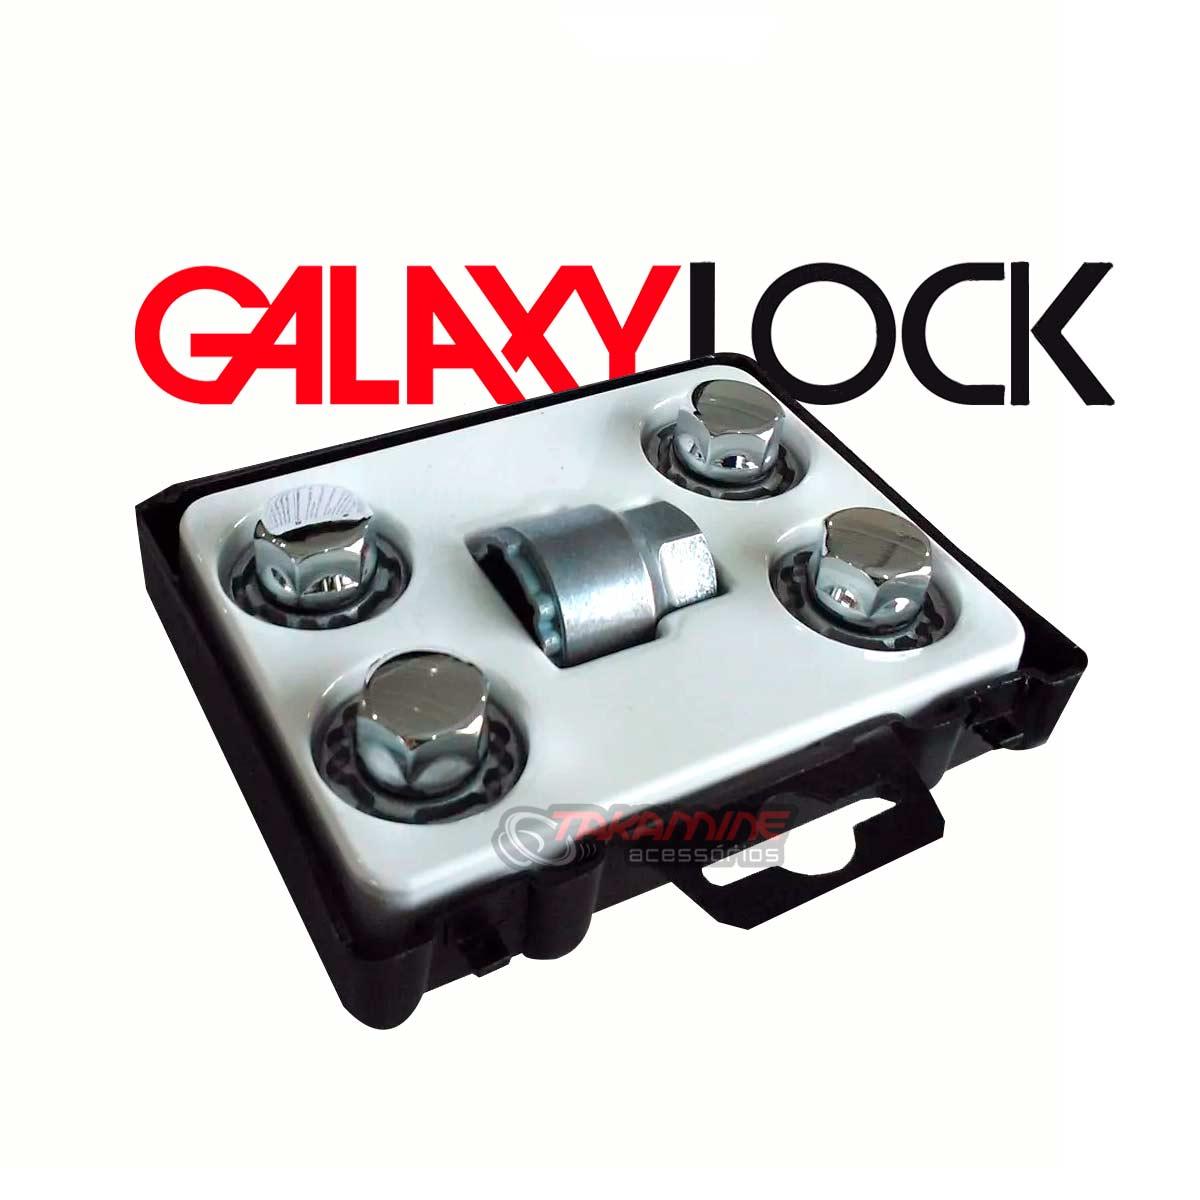 Parafuso antifurto para rodas Galaxy Lock Compass 2016 até 2020 A1C/M